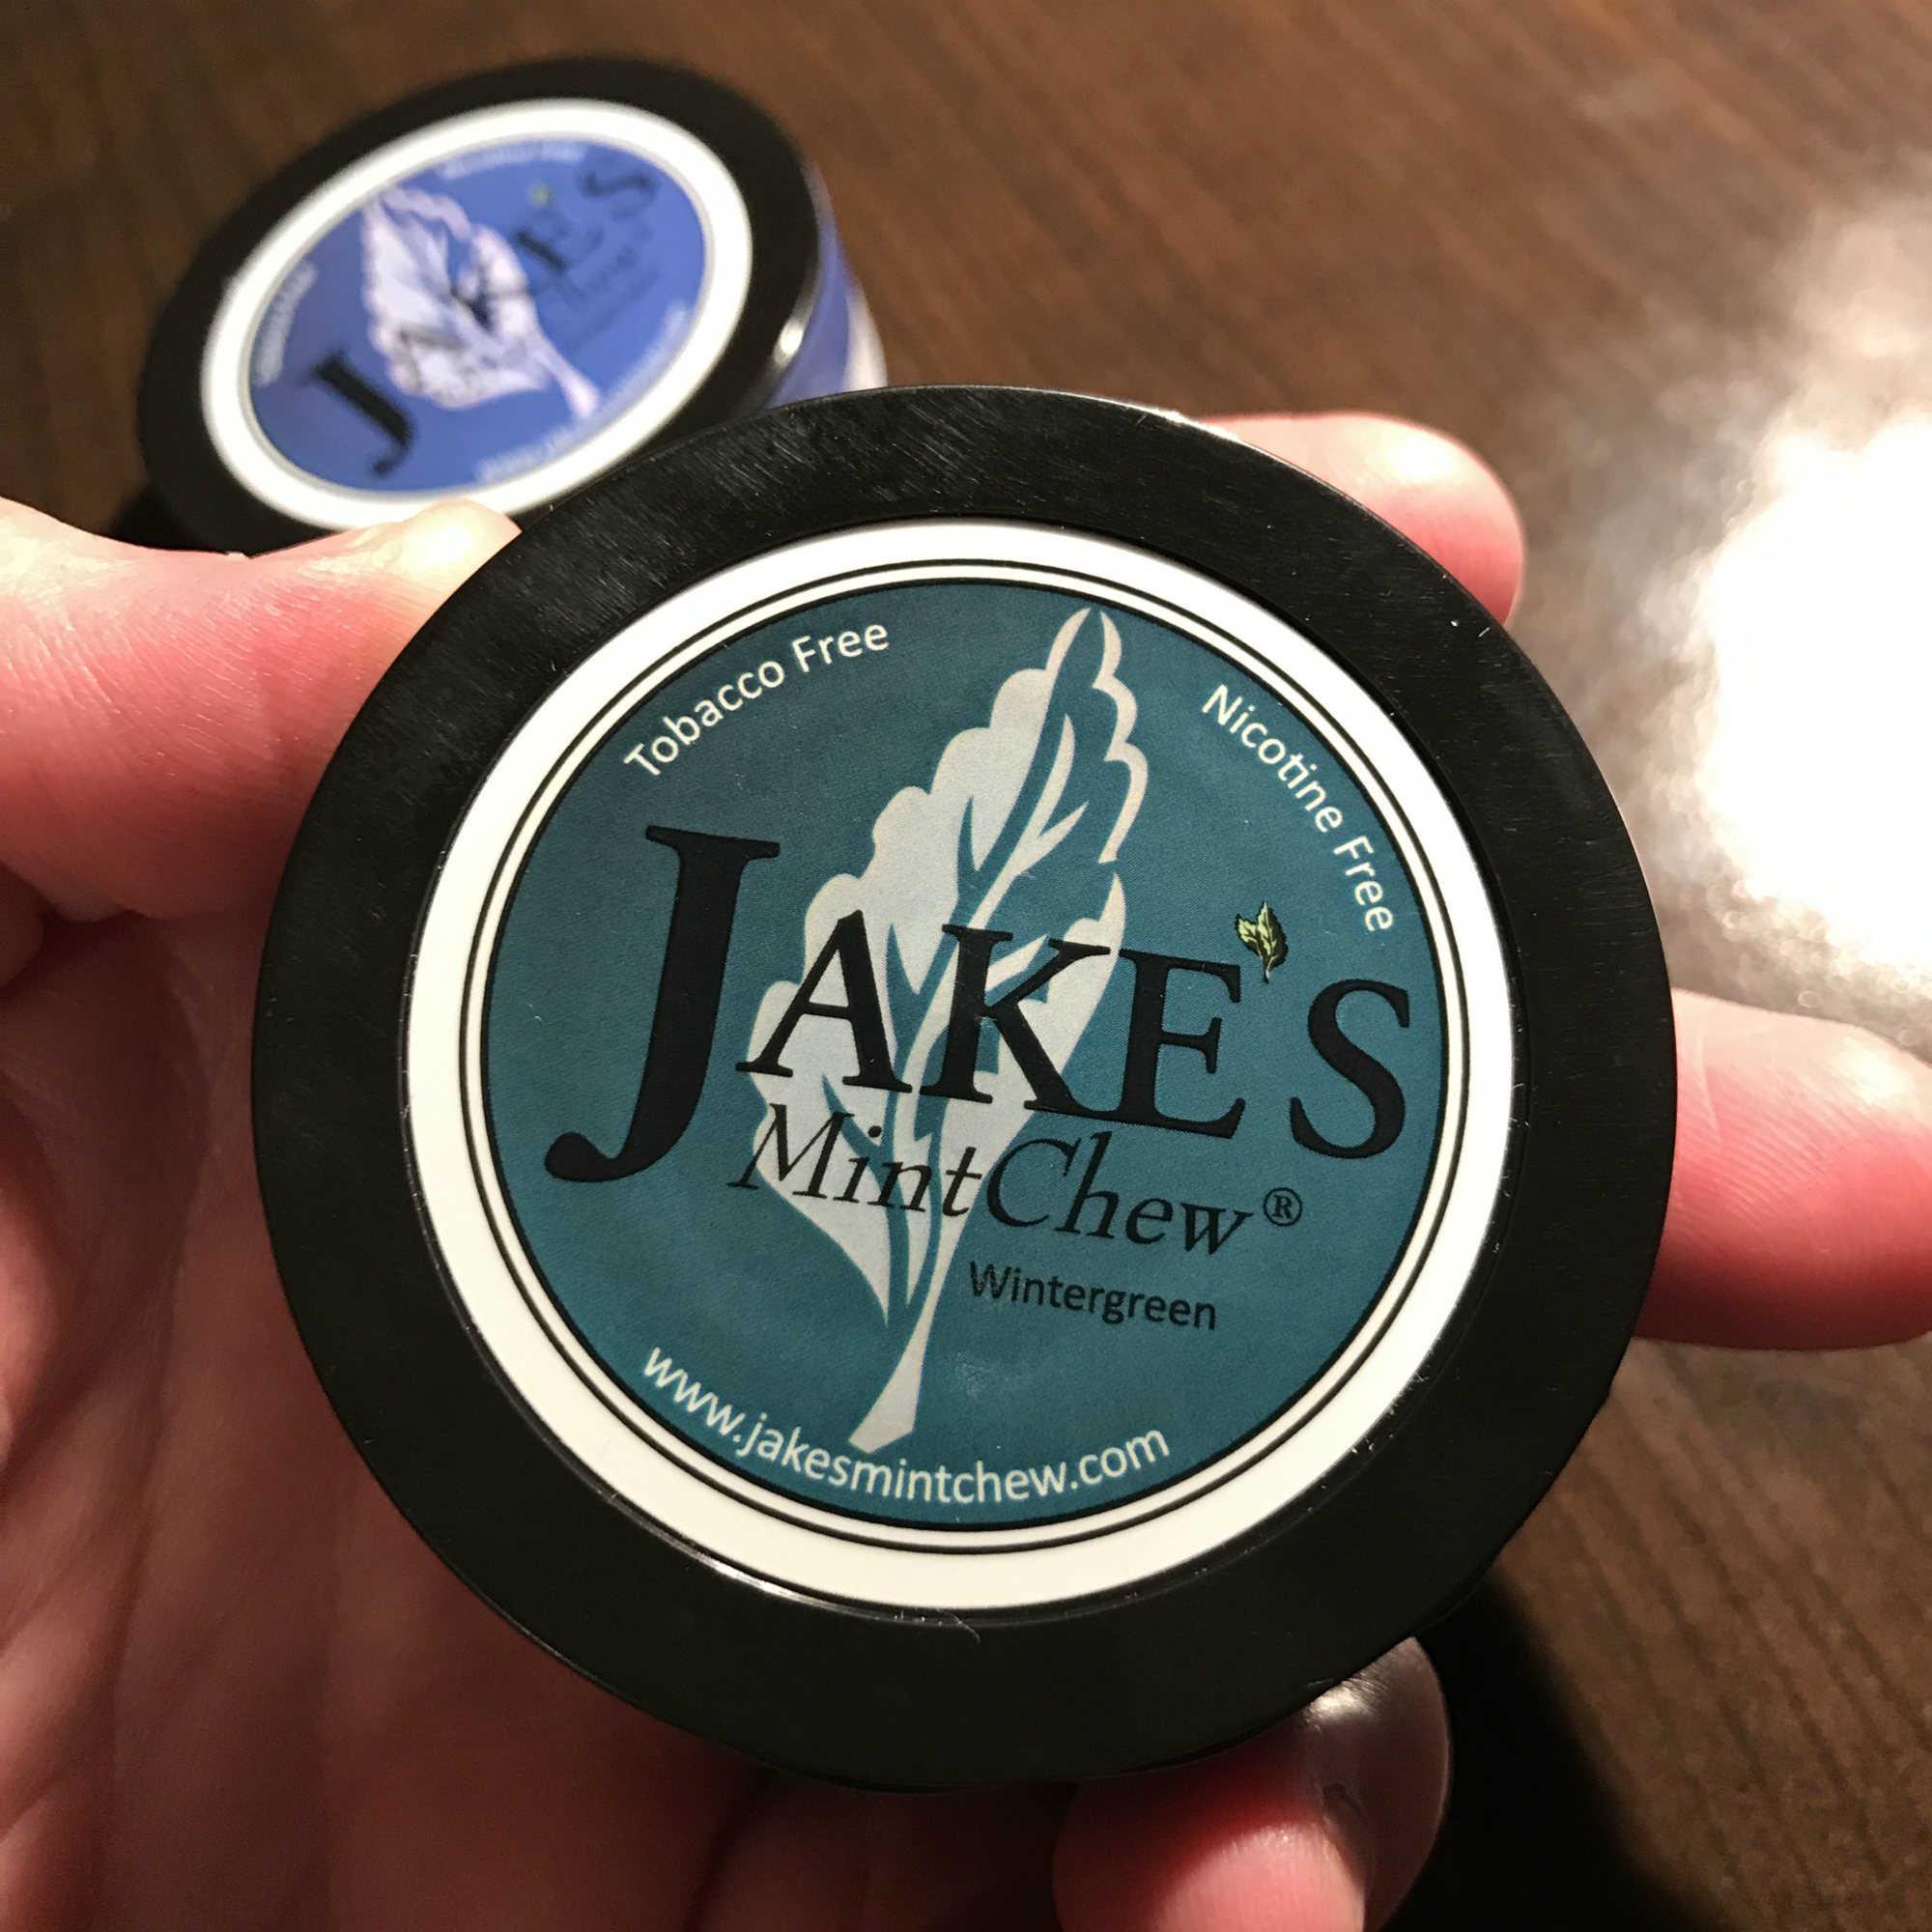 Jake's Mint Chew Pouches - Wintergreen